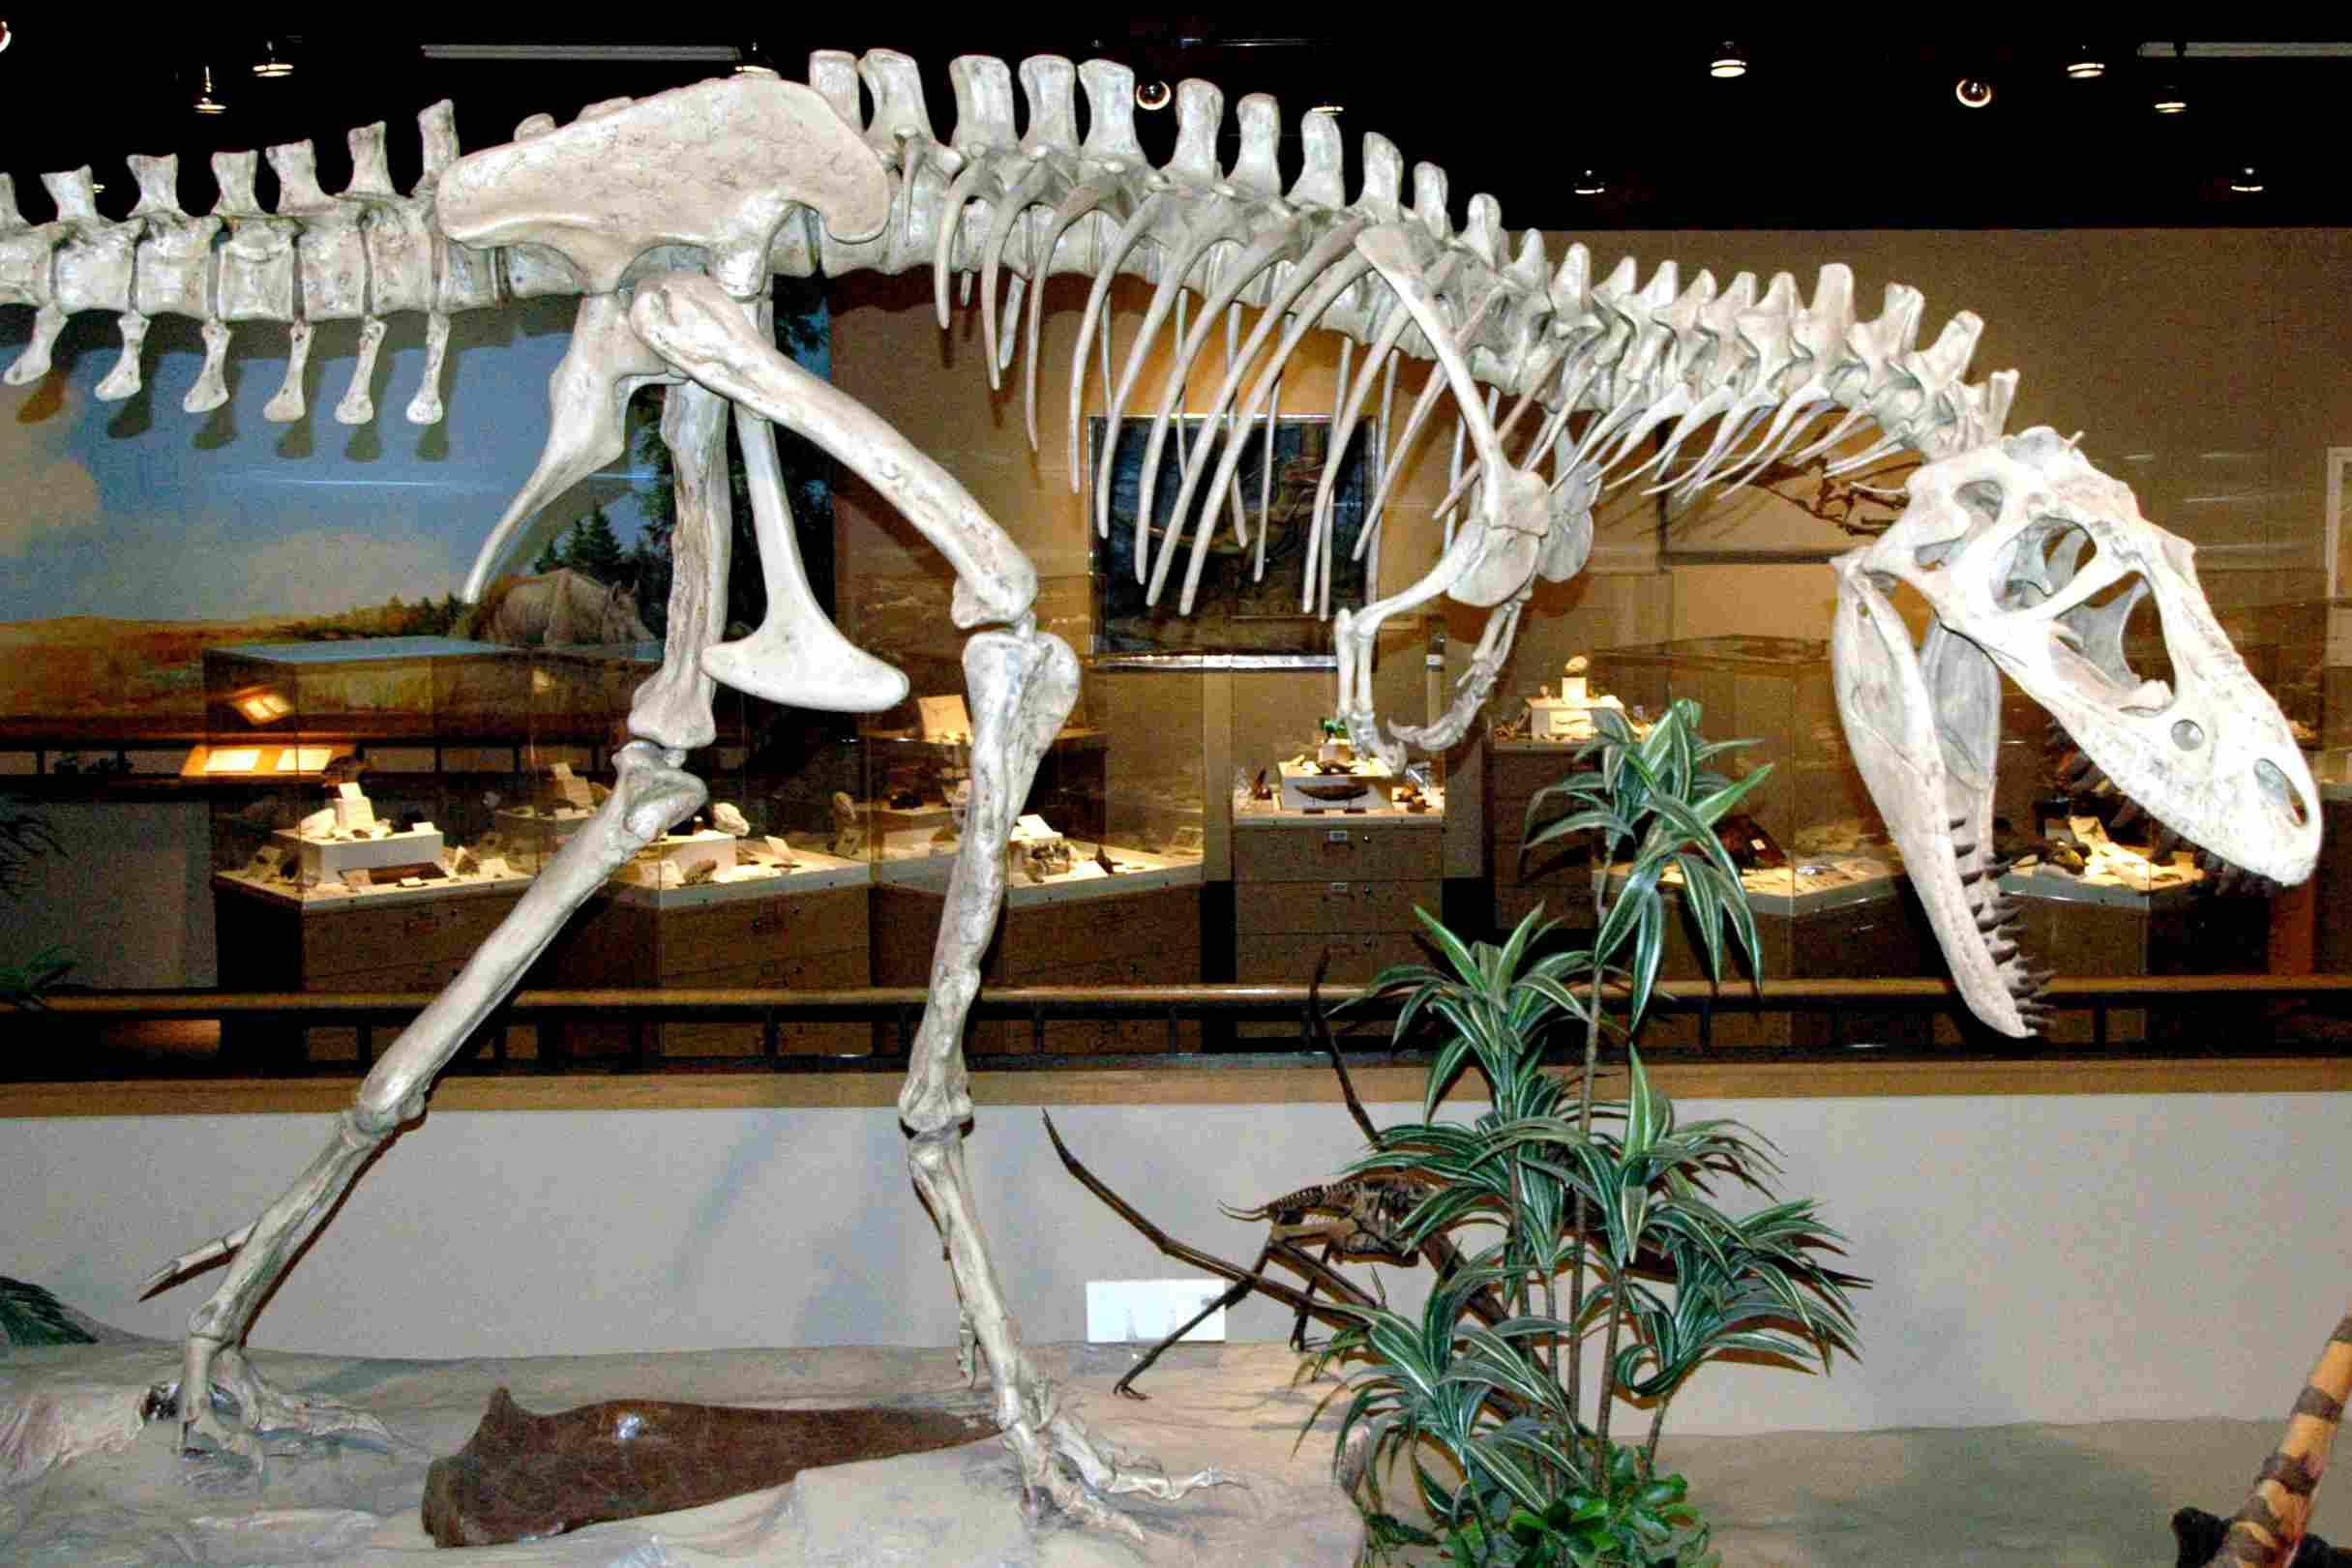 A albertosaurus skeleton